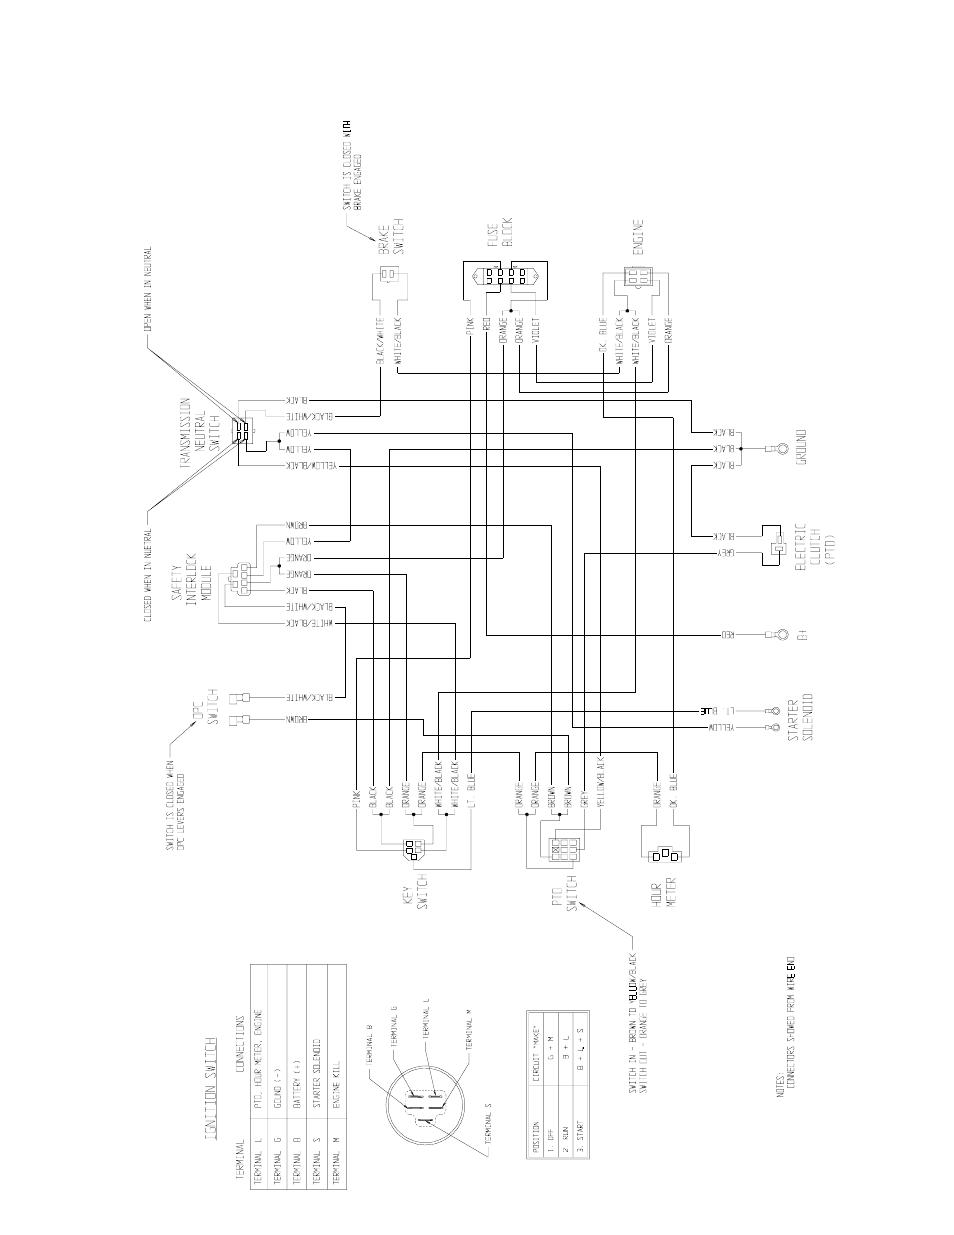 medium resolution of exmark model lz28ka605 wiring schematic wiring library exmark model lz28ka605 wiring schematic